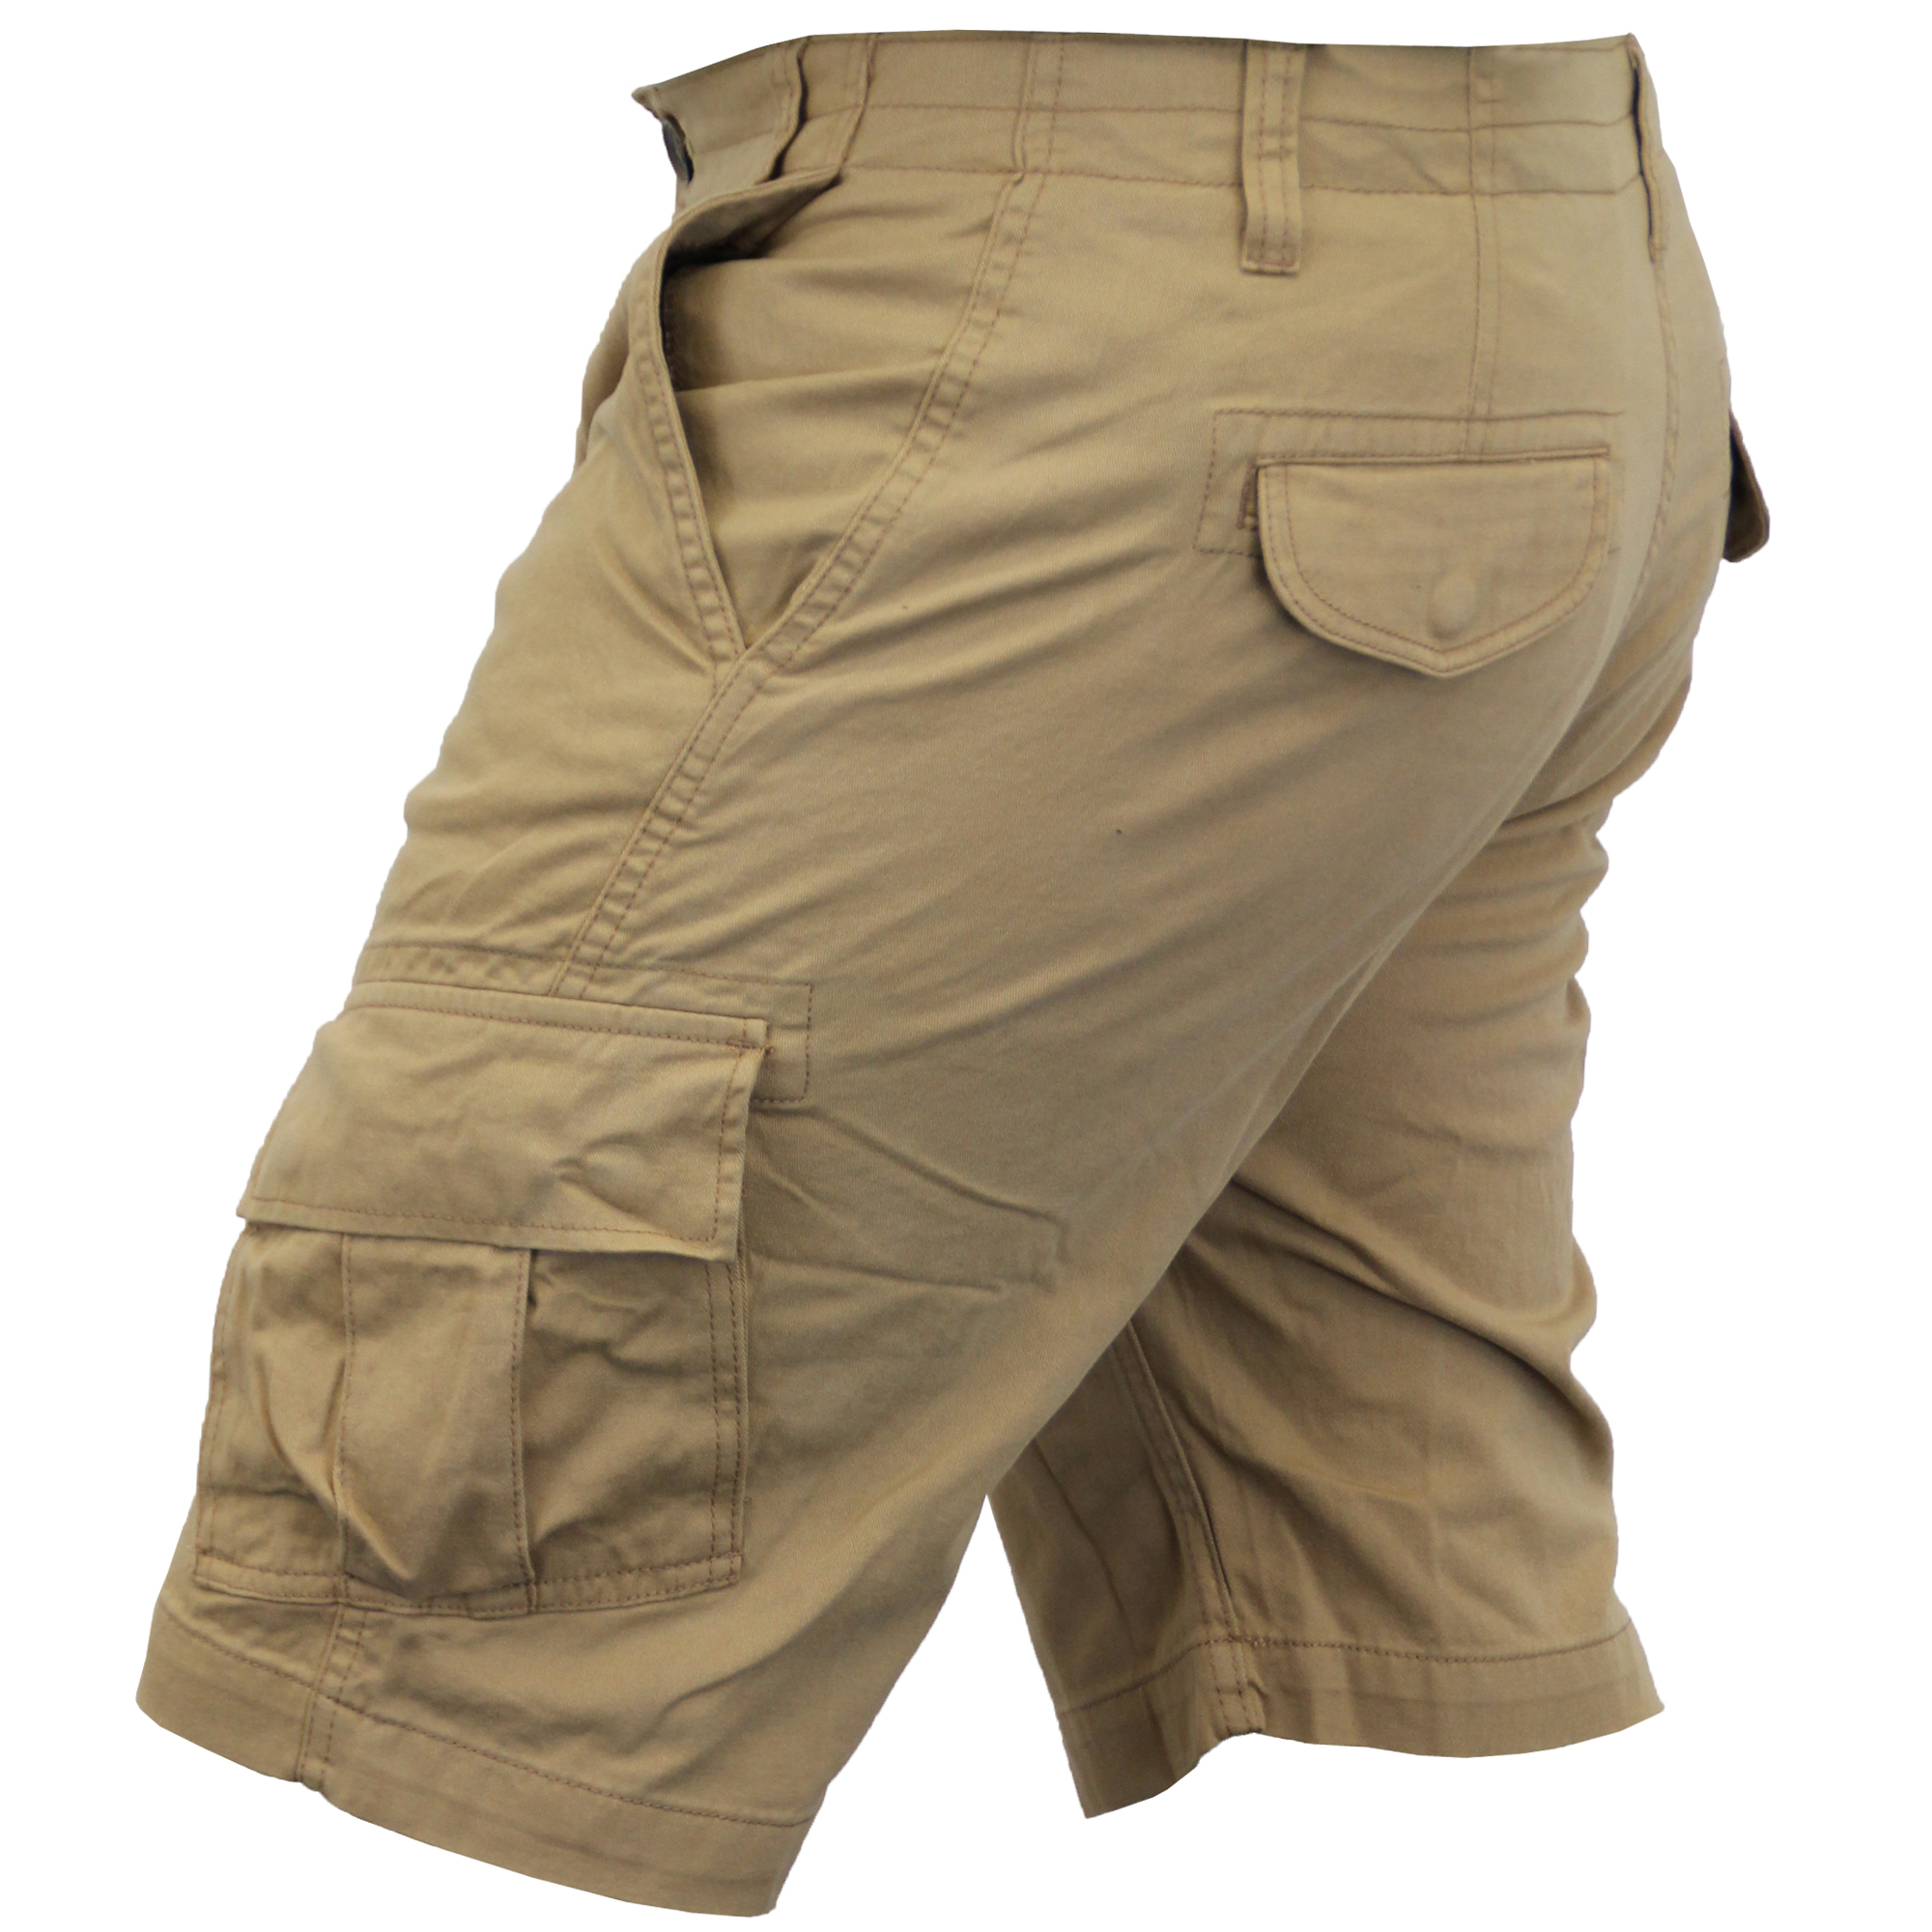 Mens-Cargo-Chino-Shorts-Threadbare-Combat-Knee-Length-Westace-Military-Summer thumbnail 23